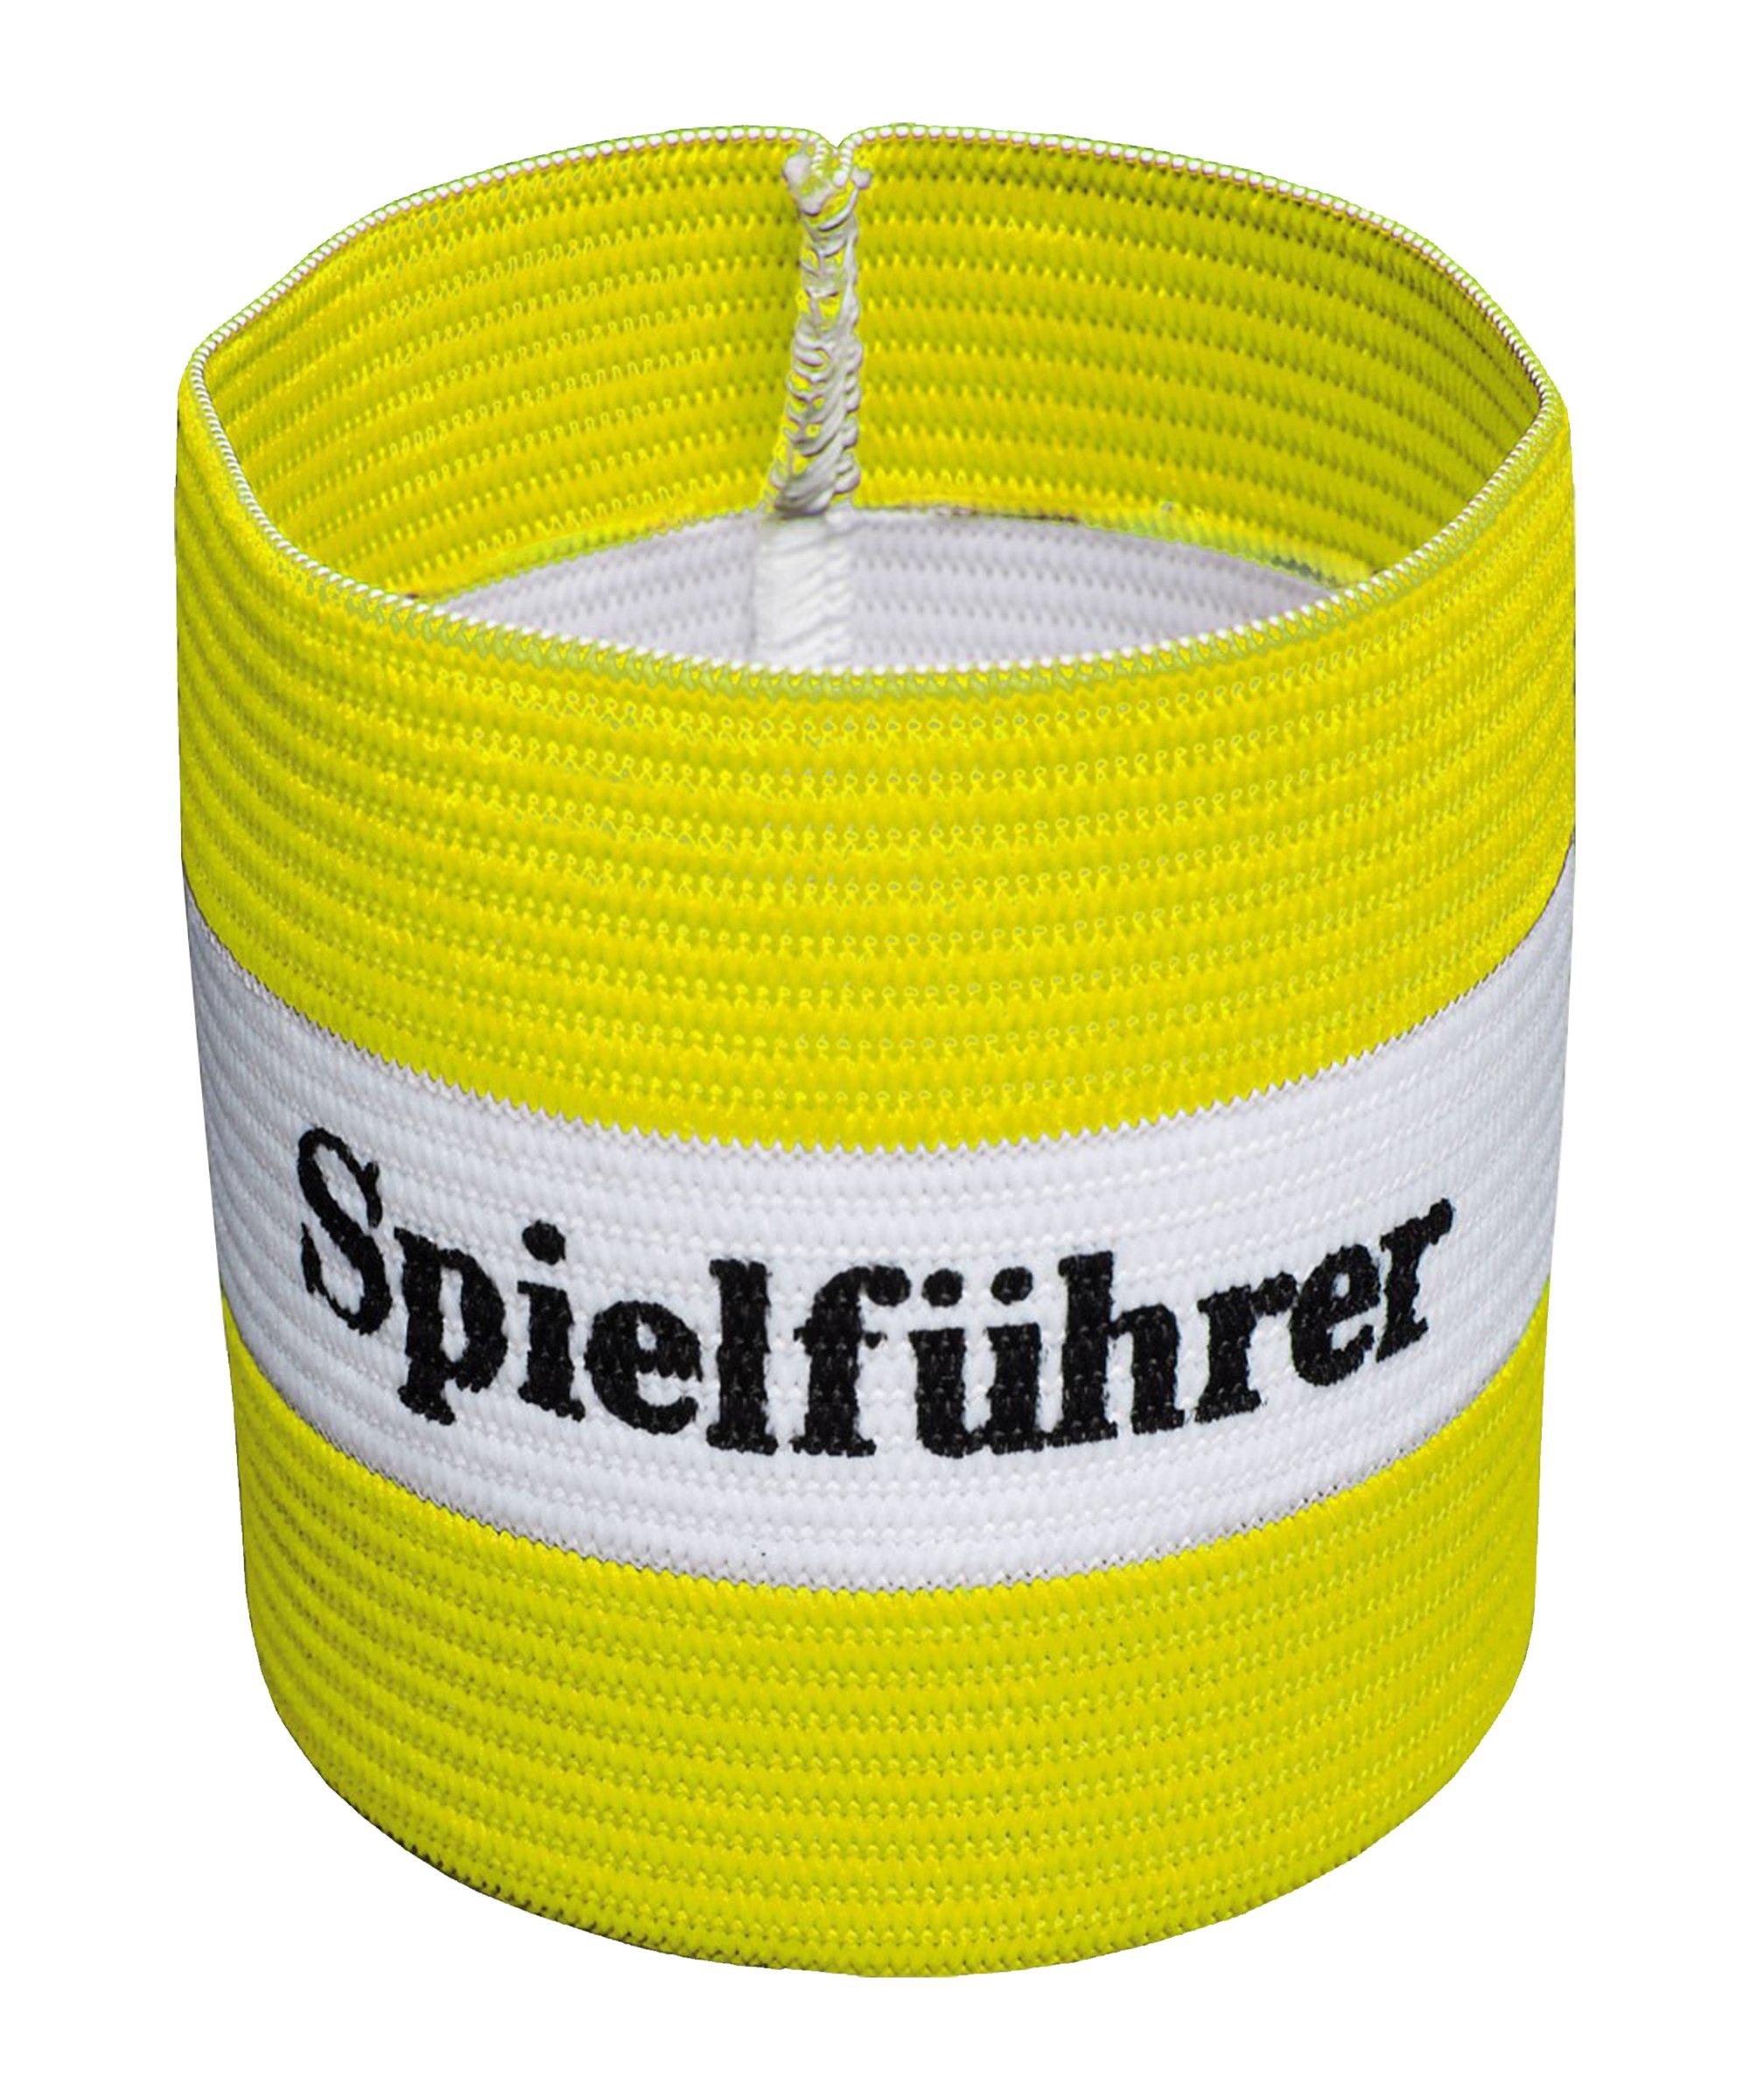 Cawila Spielführer Armbinde Senior Gelb - gelb